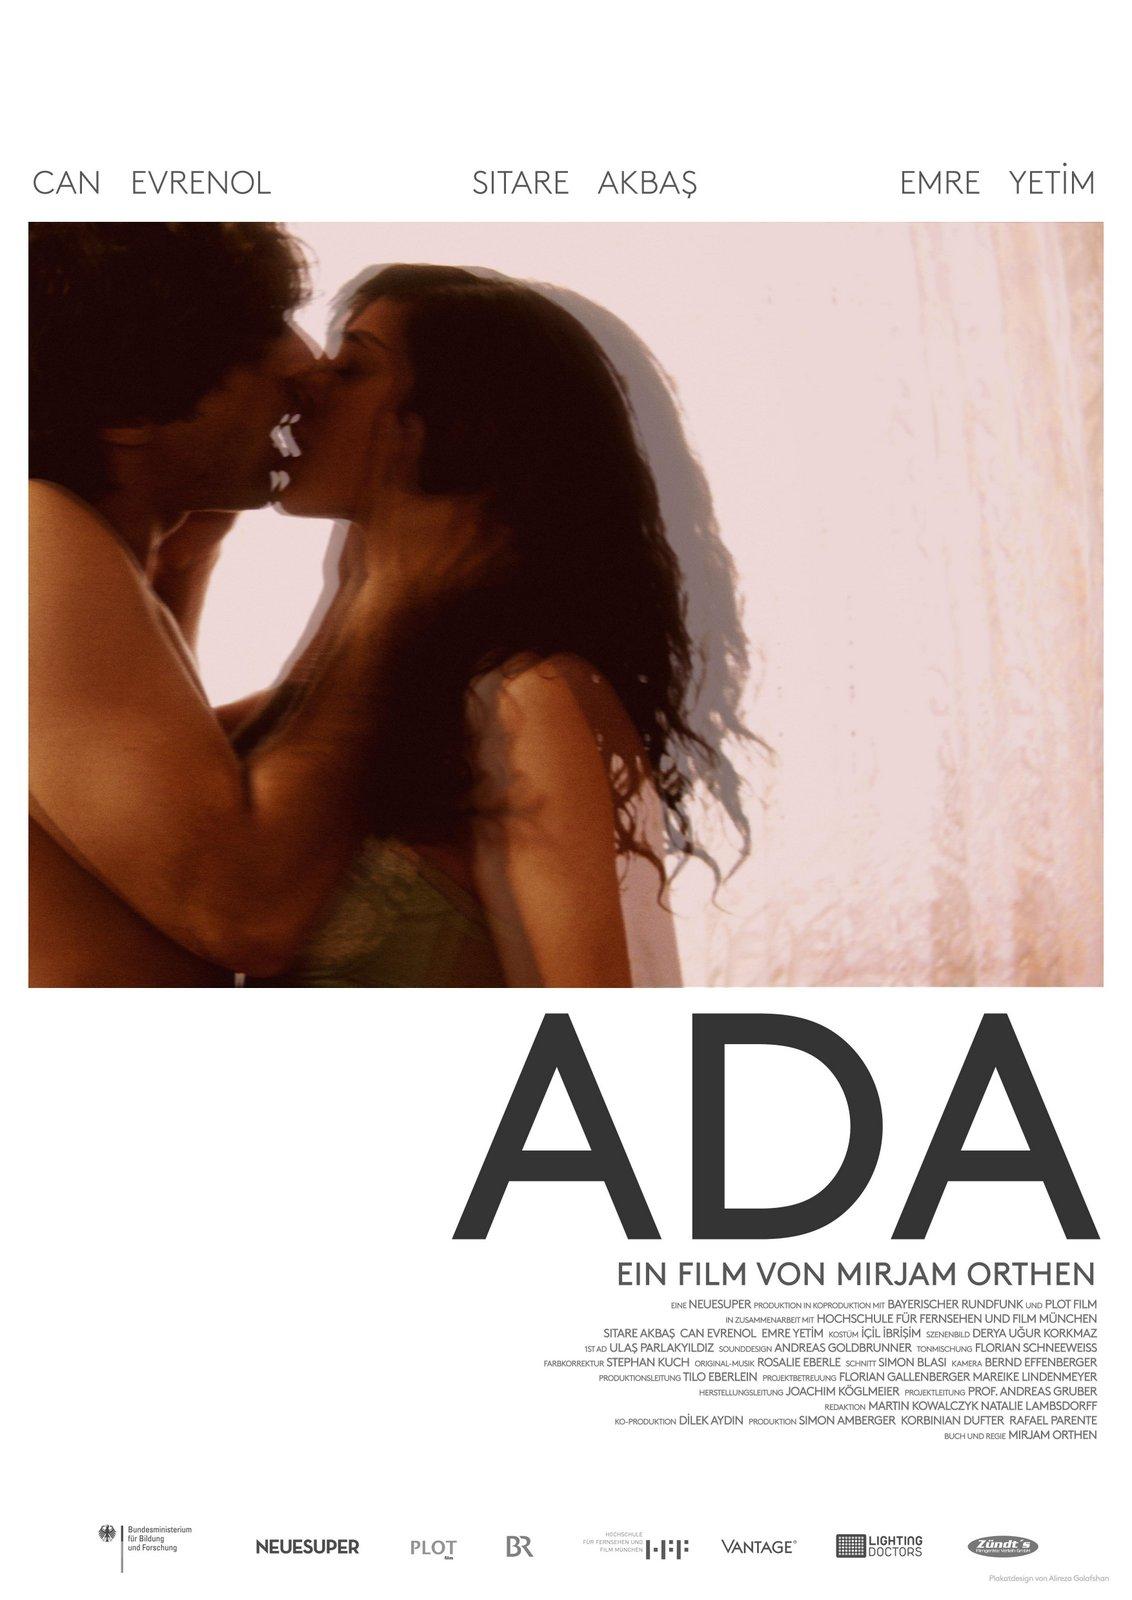 Ada (a).jpg